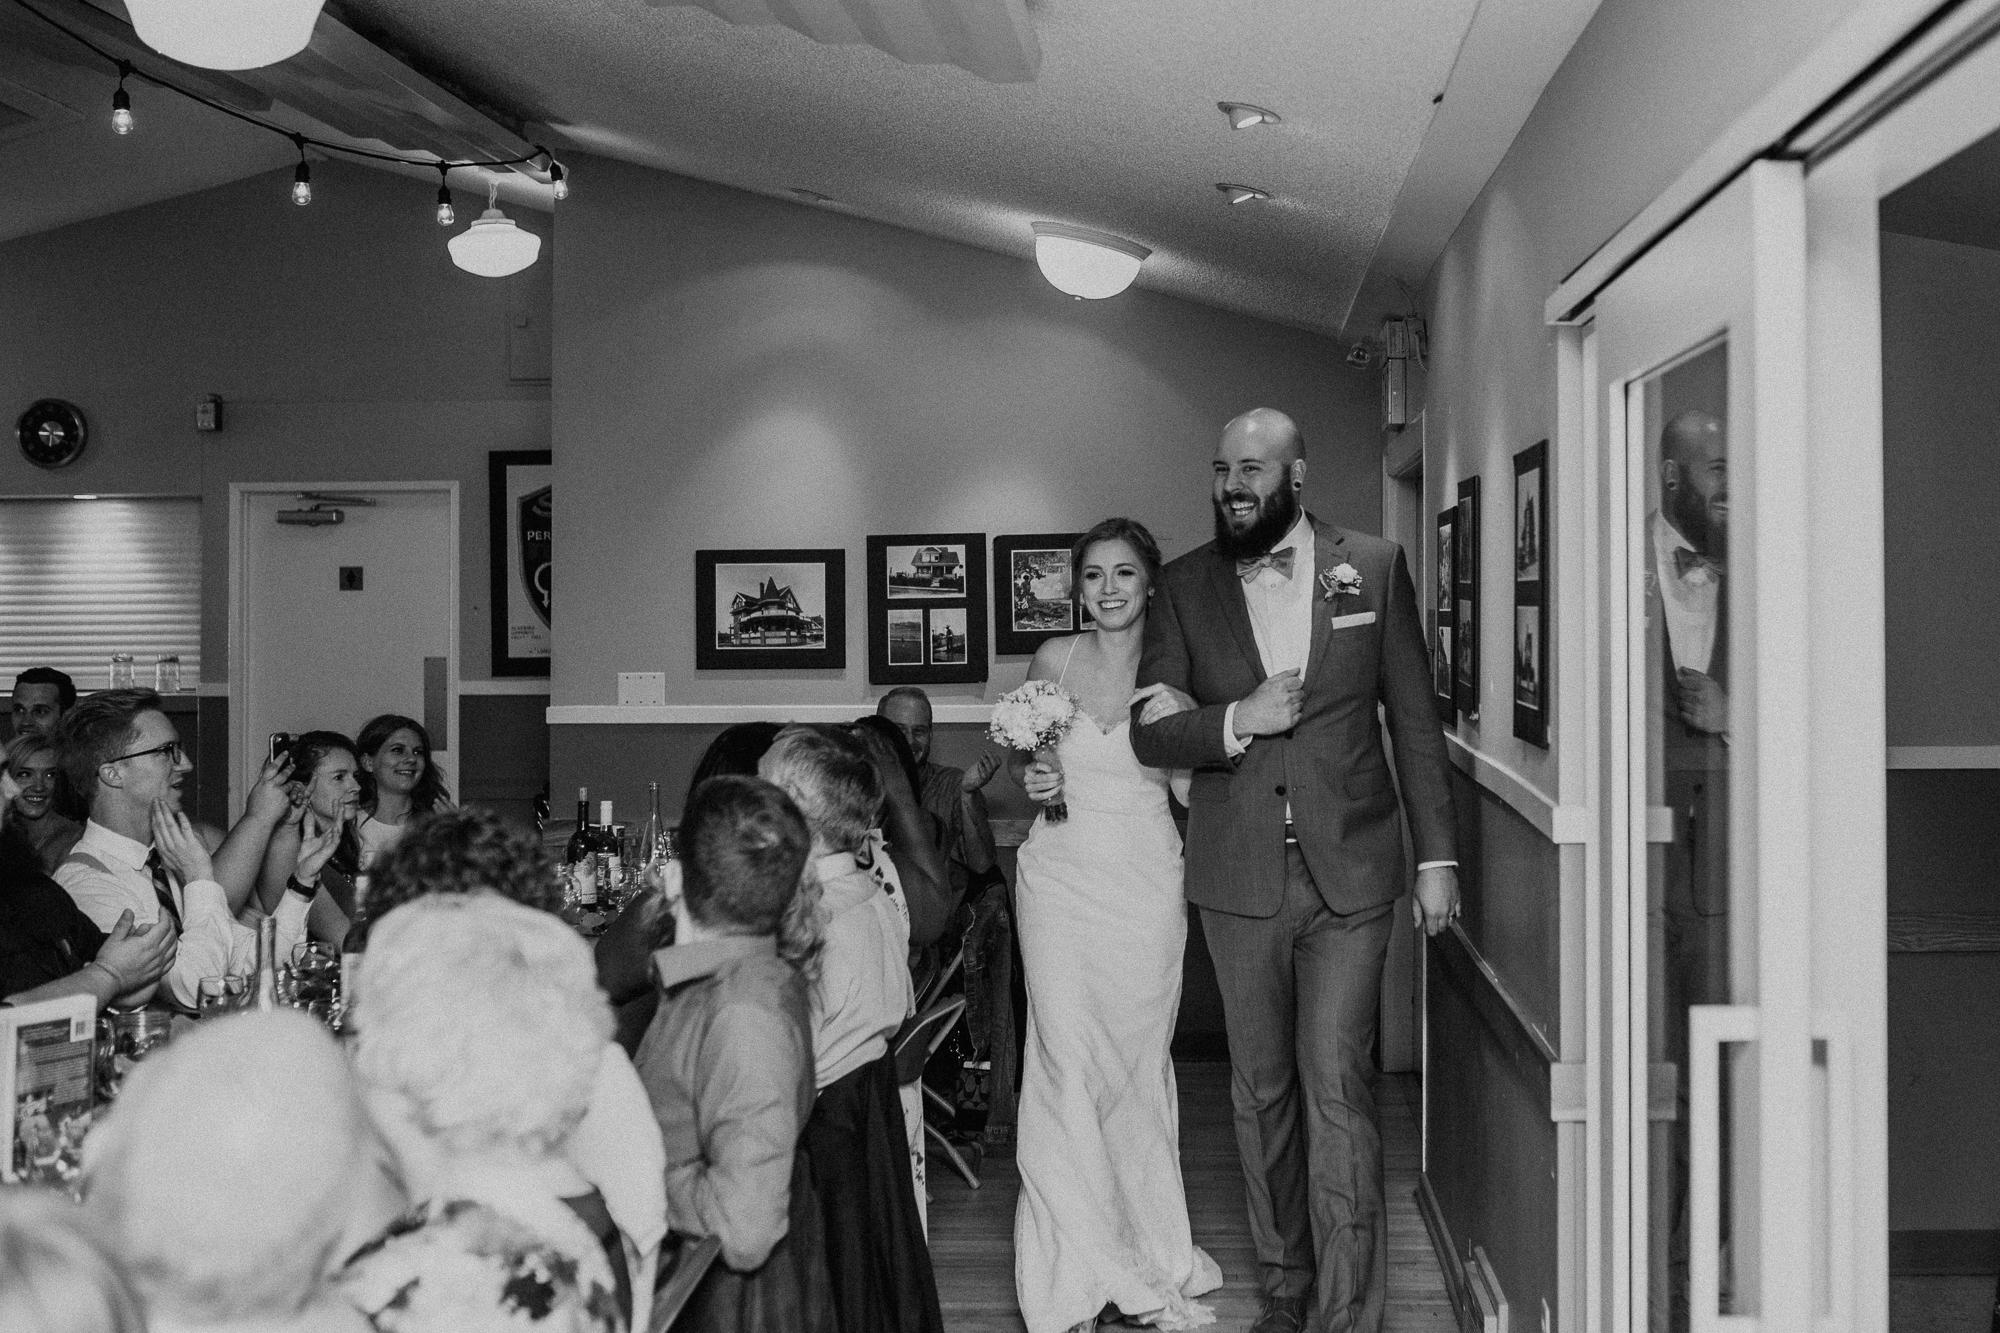 Calgary-wedding-photographer-am-77.jpg